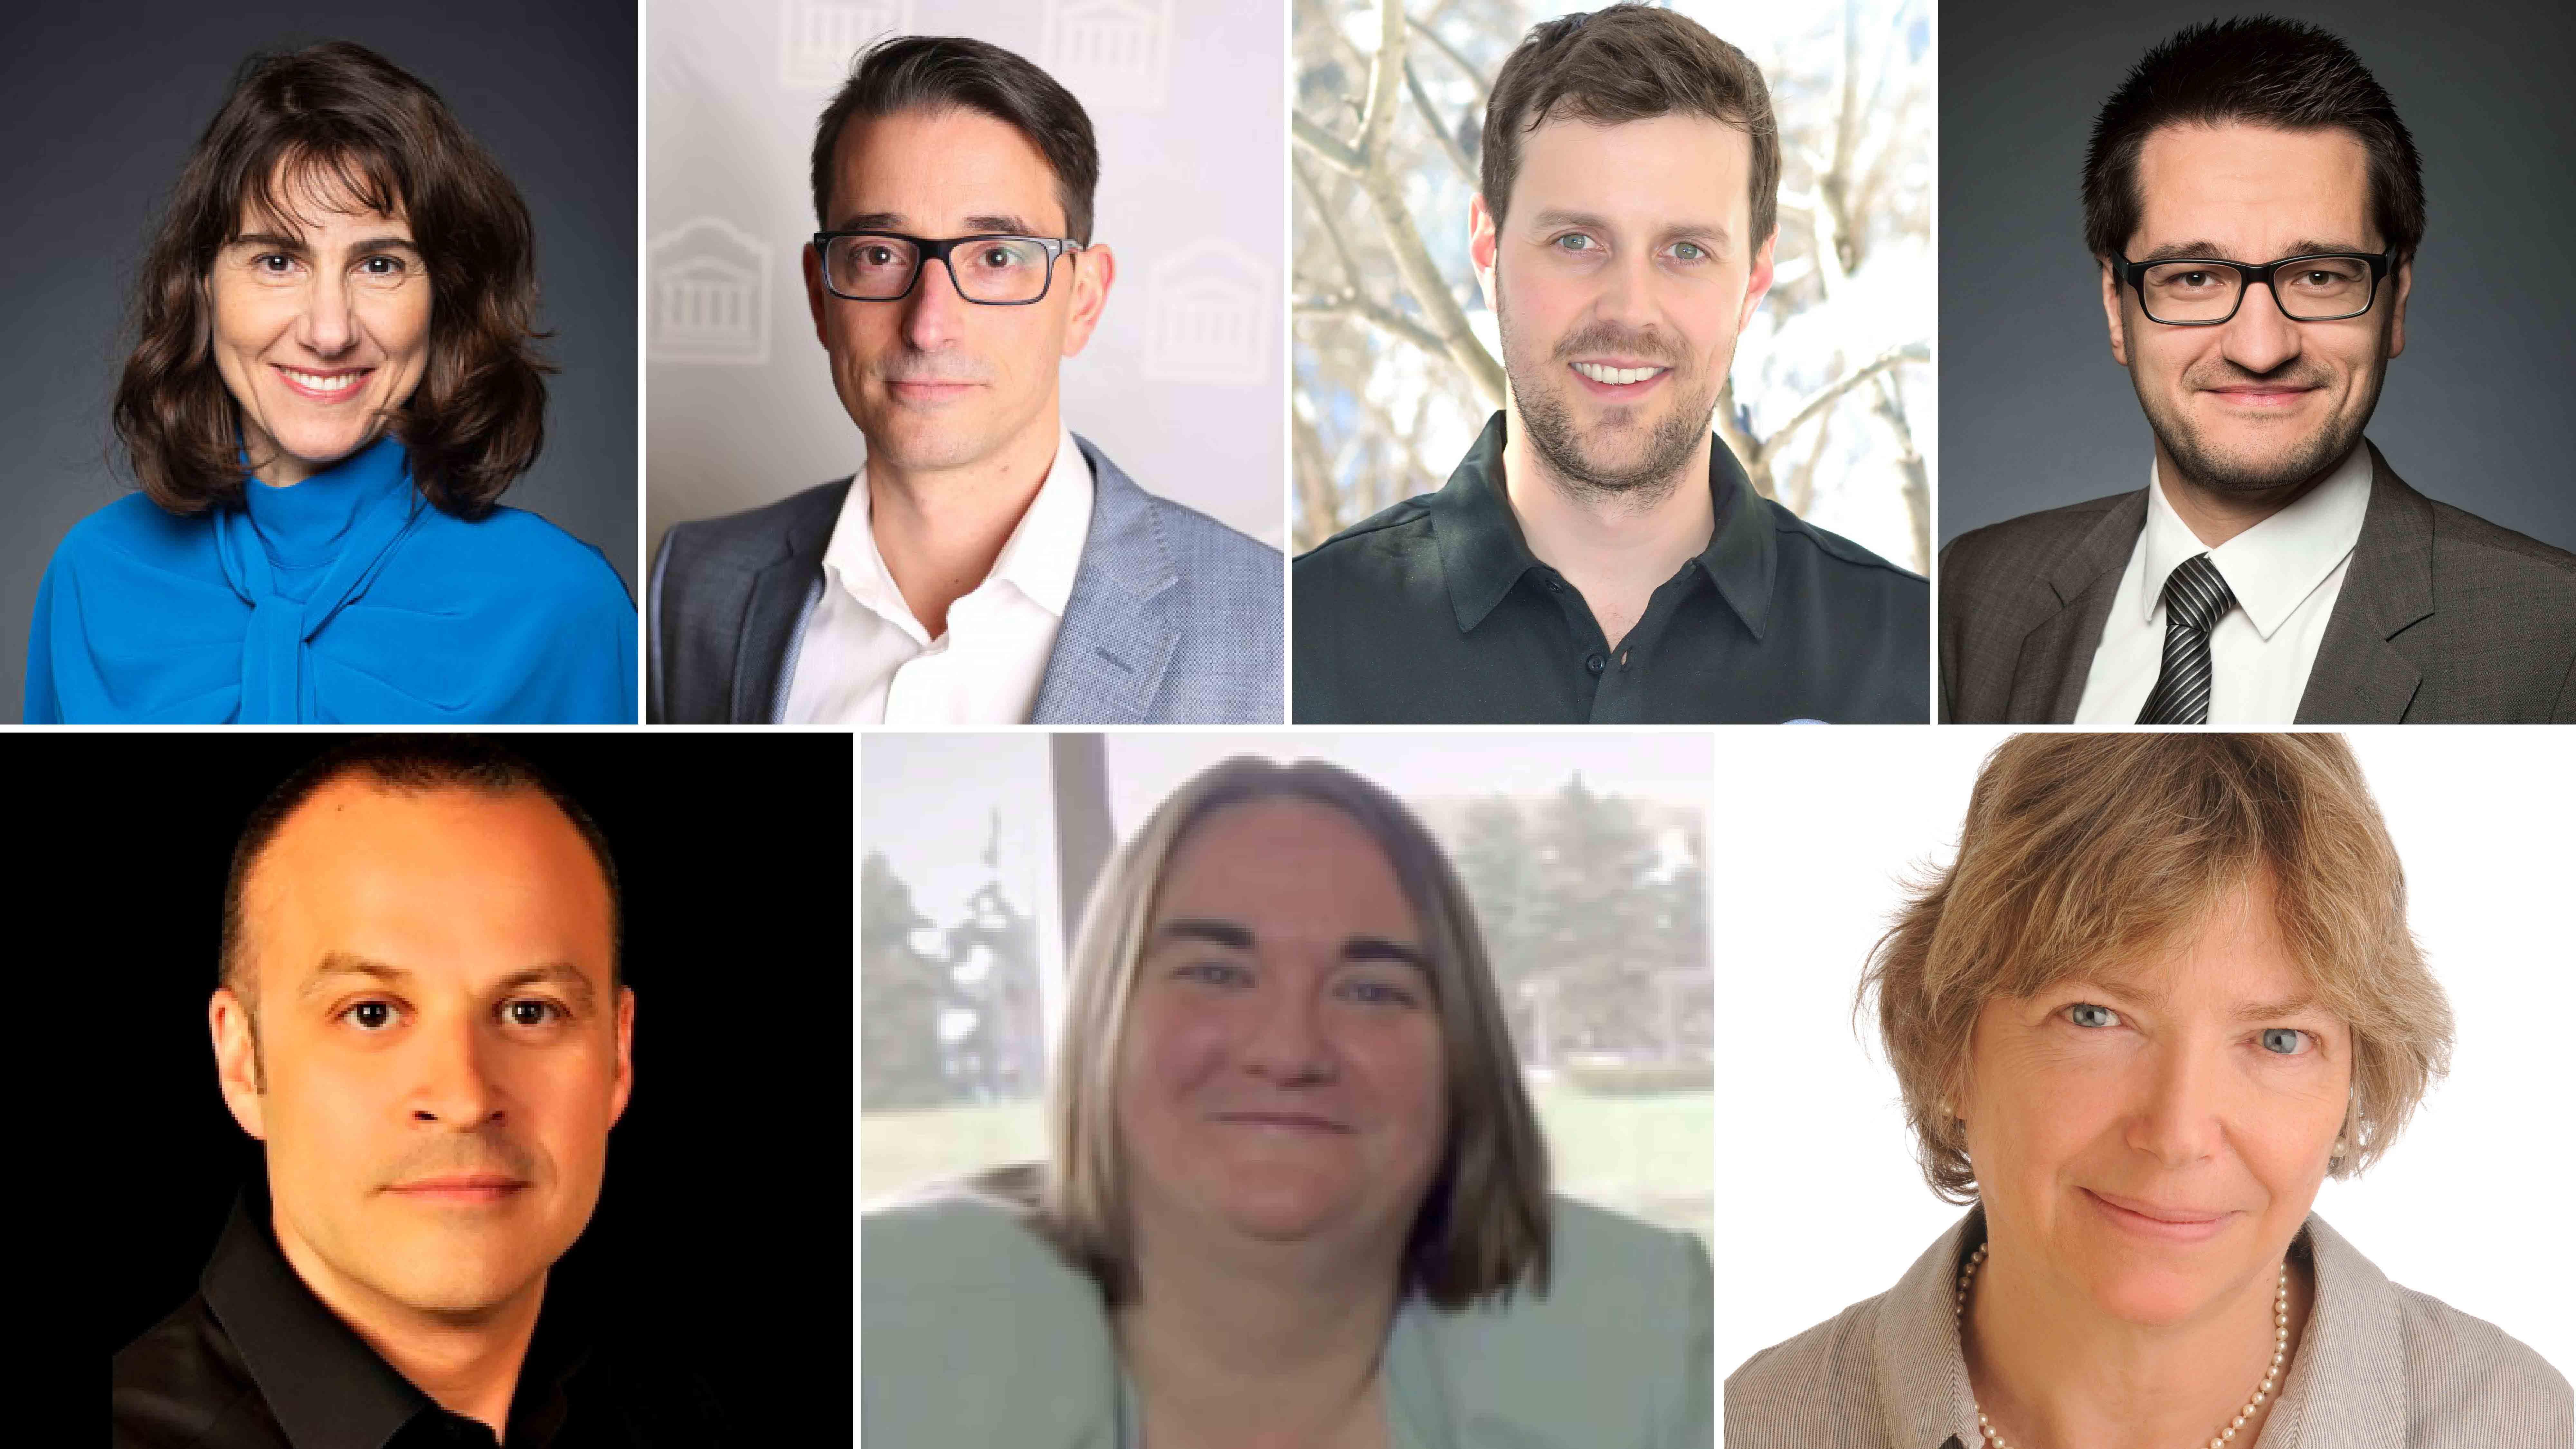 Céline Castets-Renard, Nicolas Corradi, Ryan Graham, Florian Martin-Bariteau, Dave Holmes, Janet Squires and Katherine Lippel